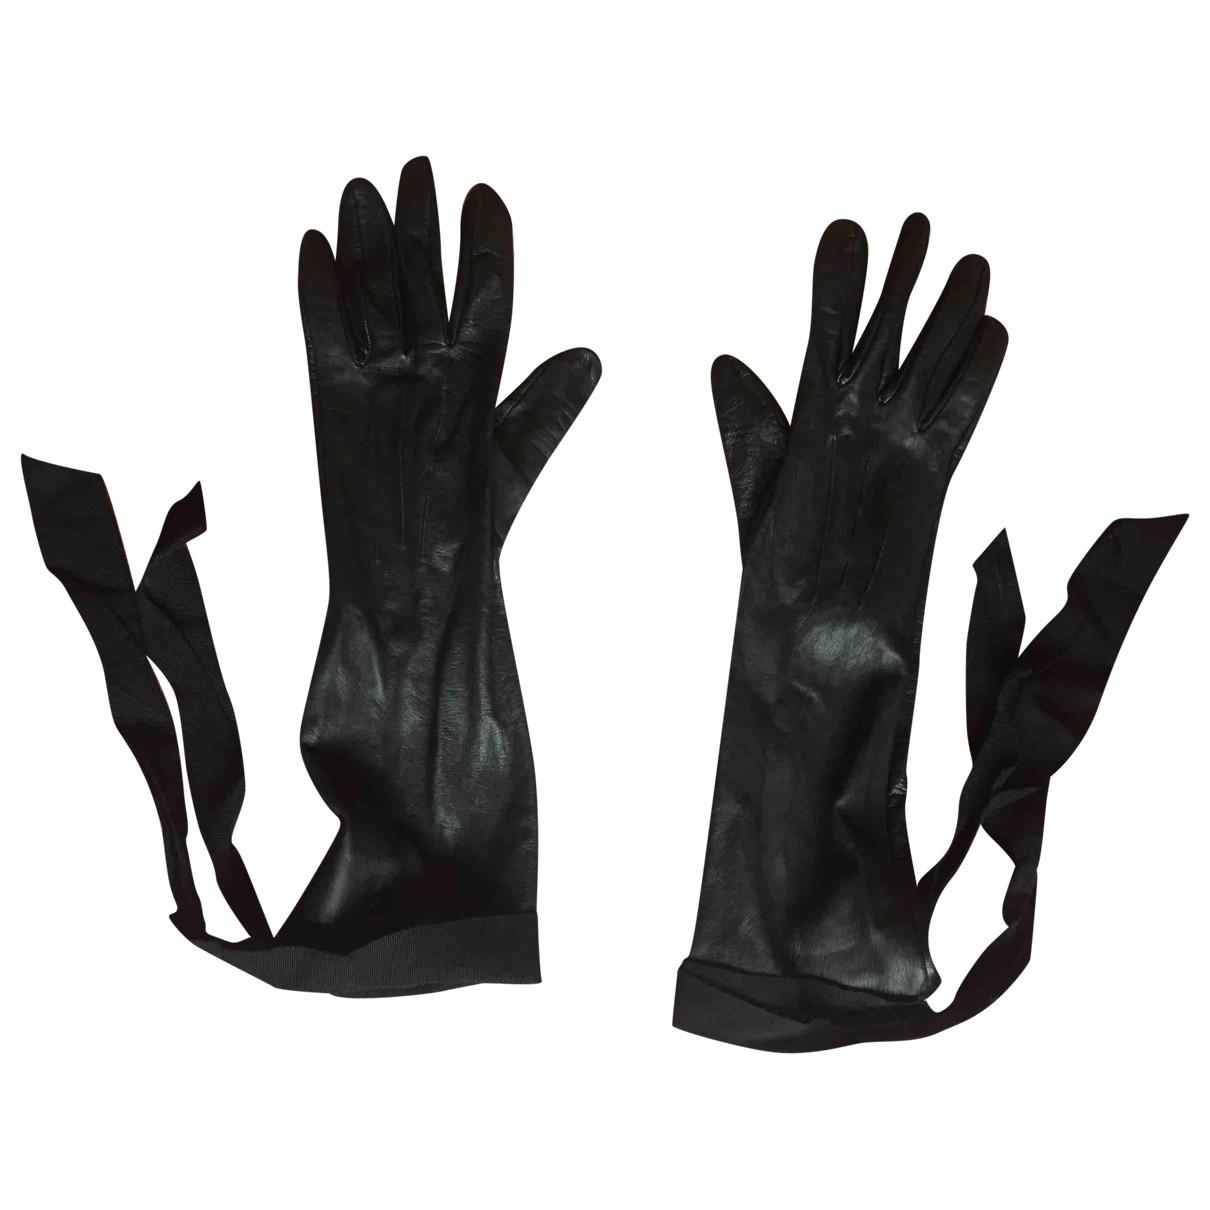 Lanvin For H&m \N Black Leather Gloves for Women M International